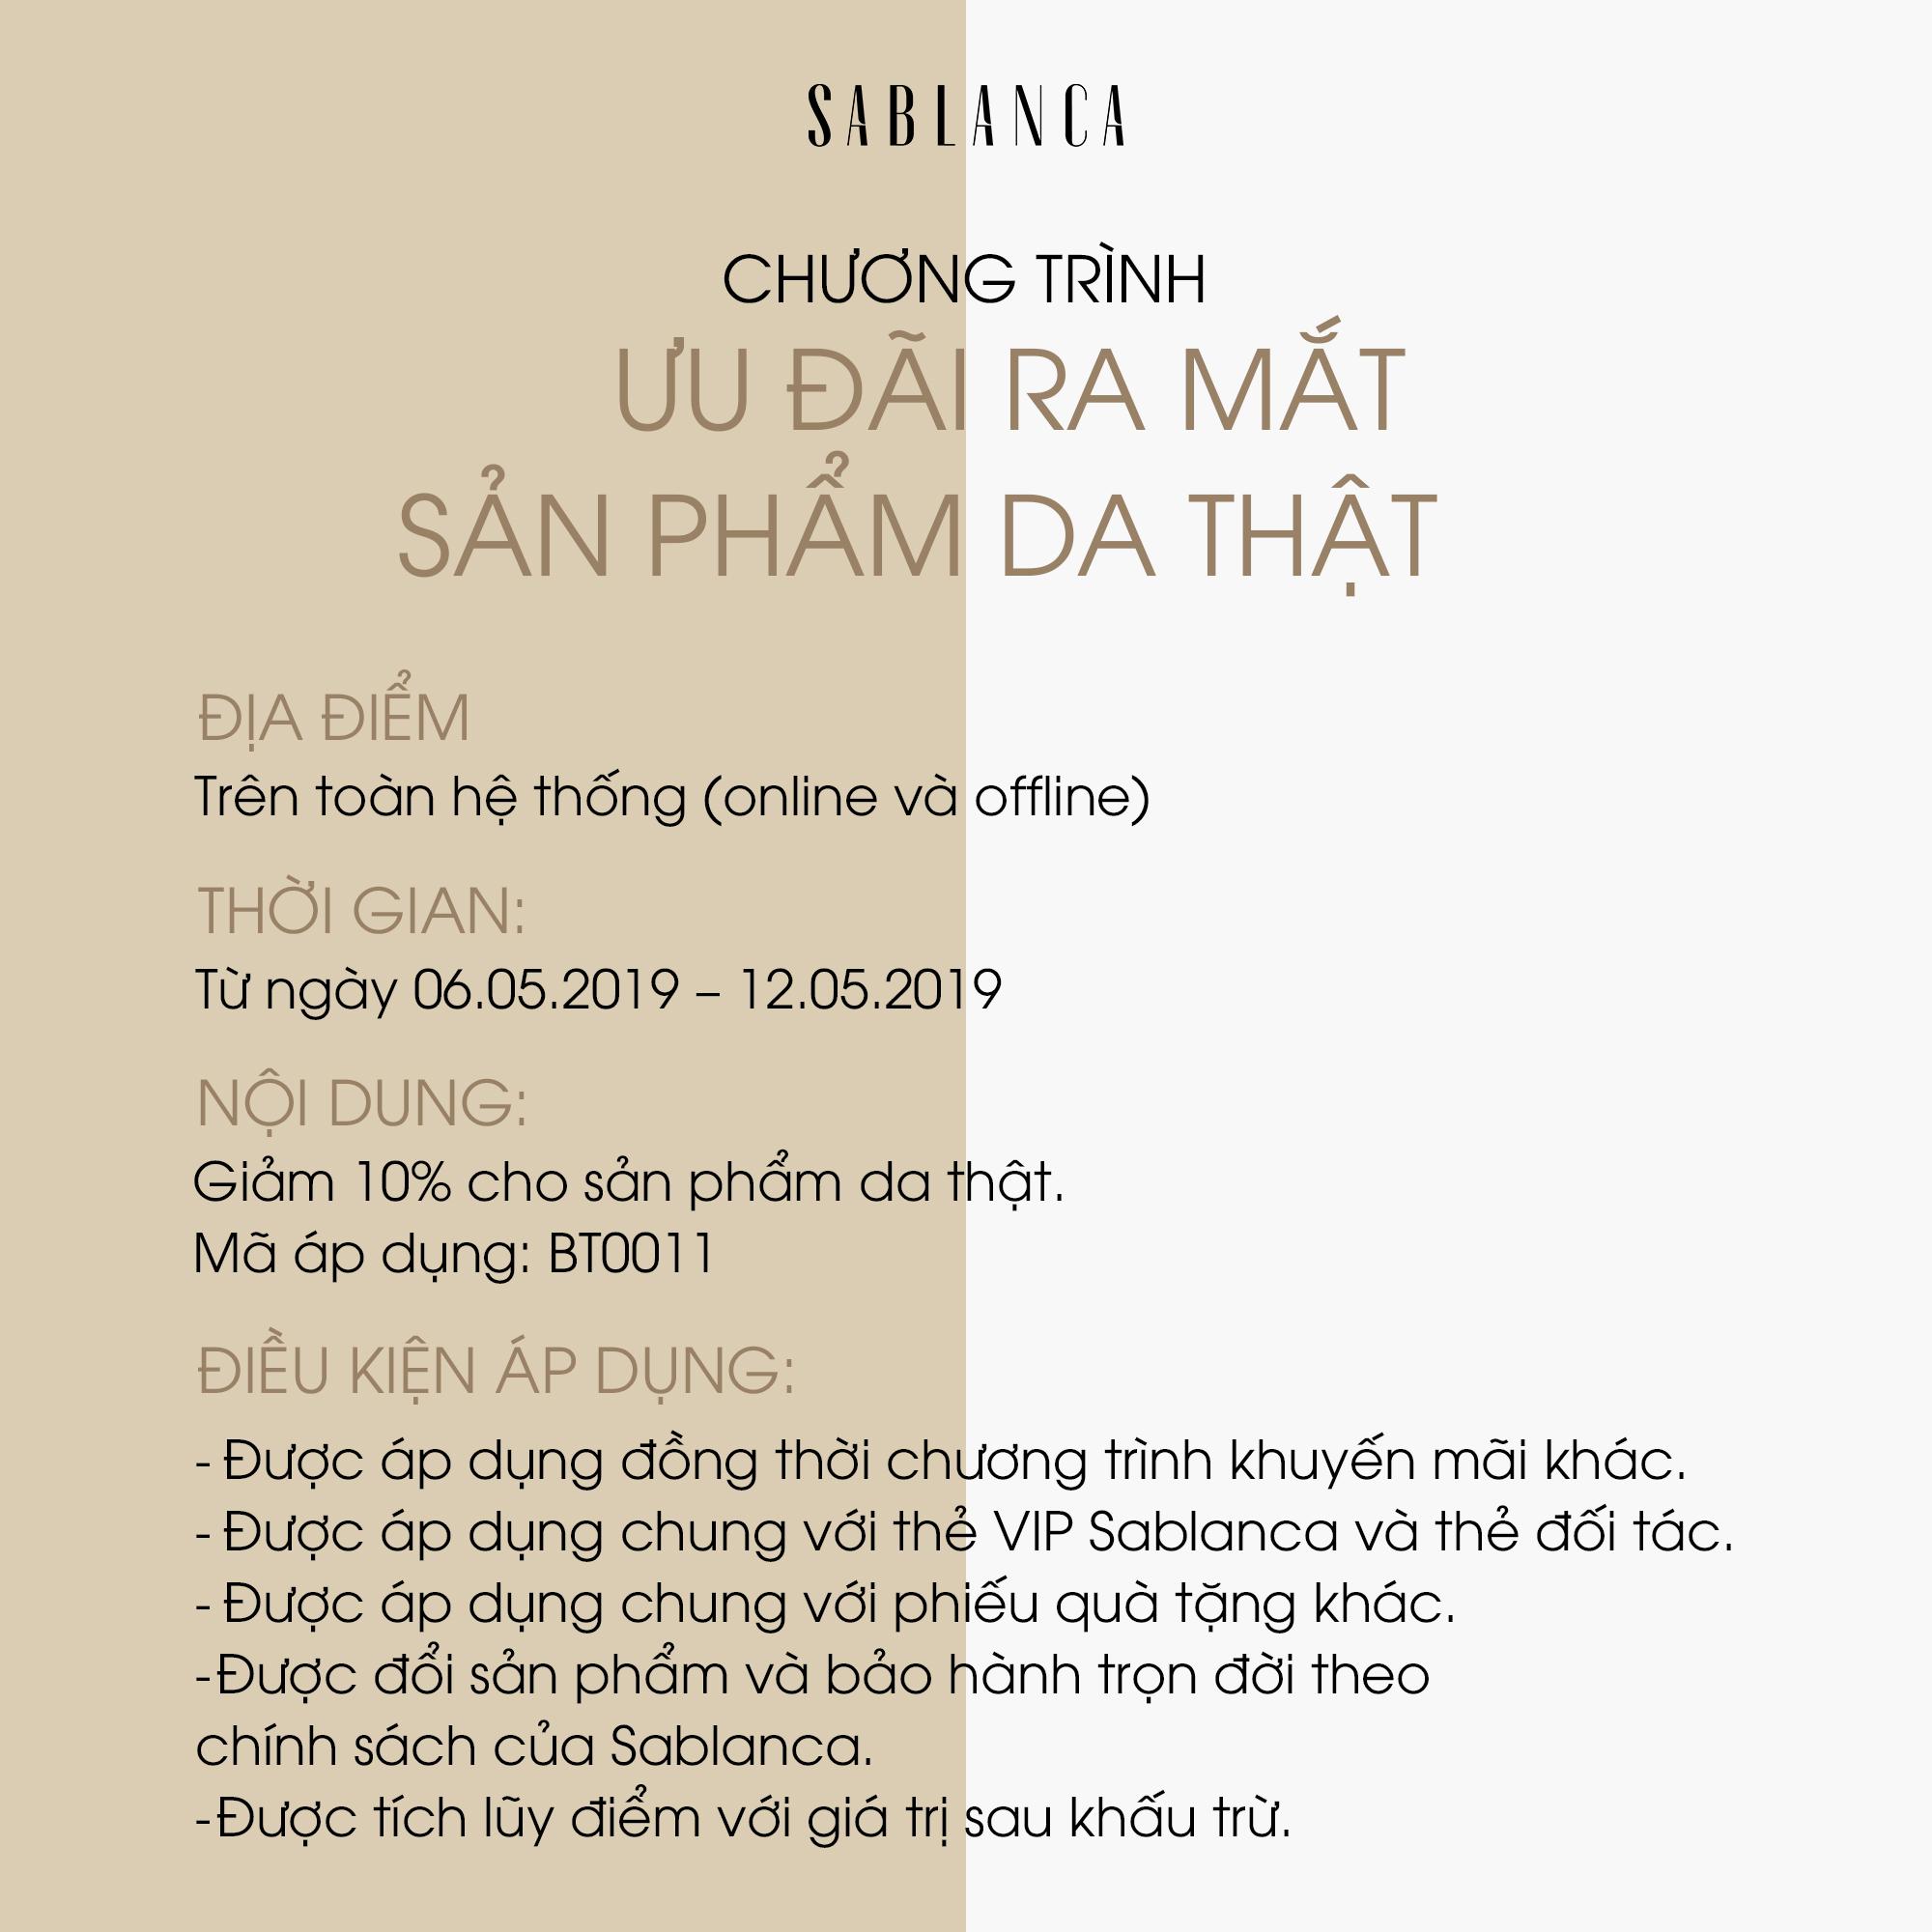 sablanca-dieu-kien-ap-dung-khuyen-mai-giay-da-dau-tien